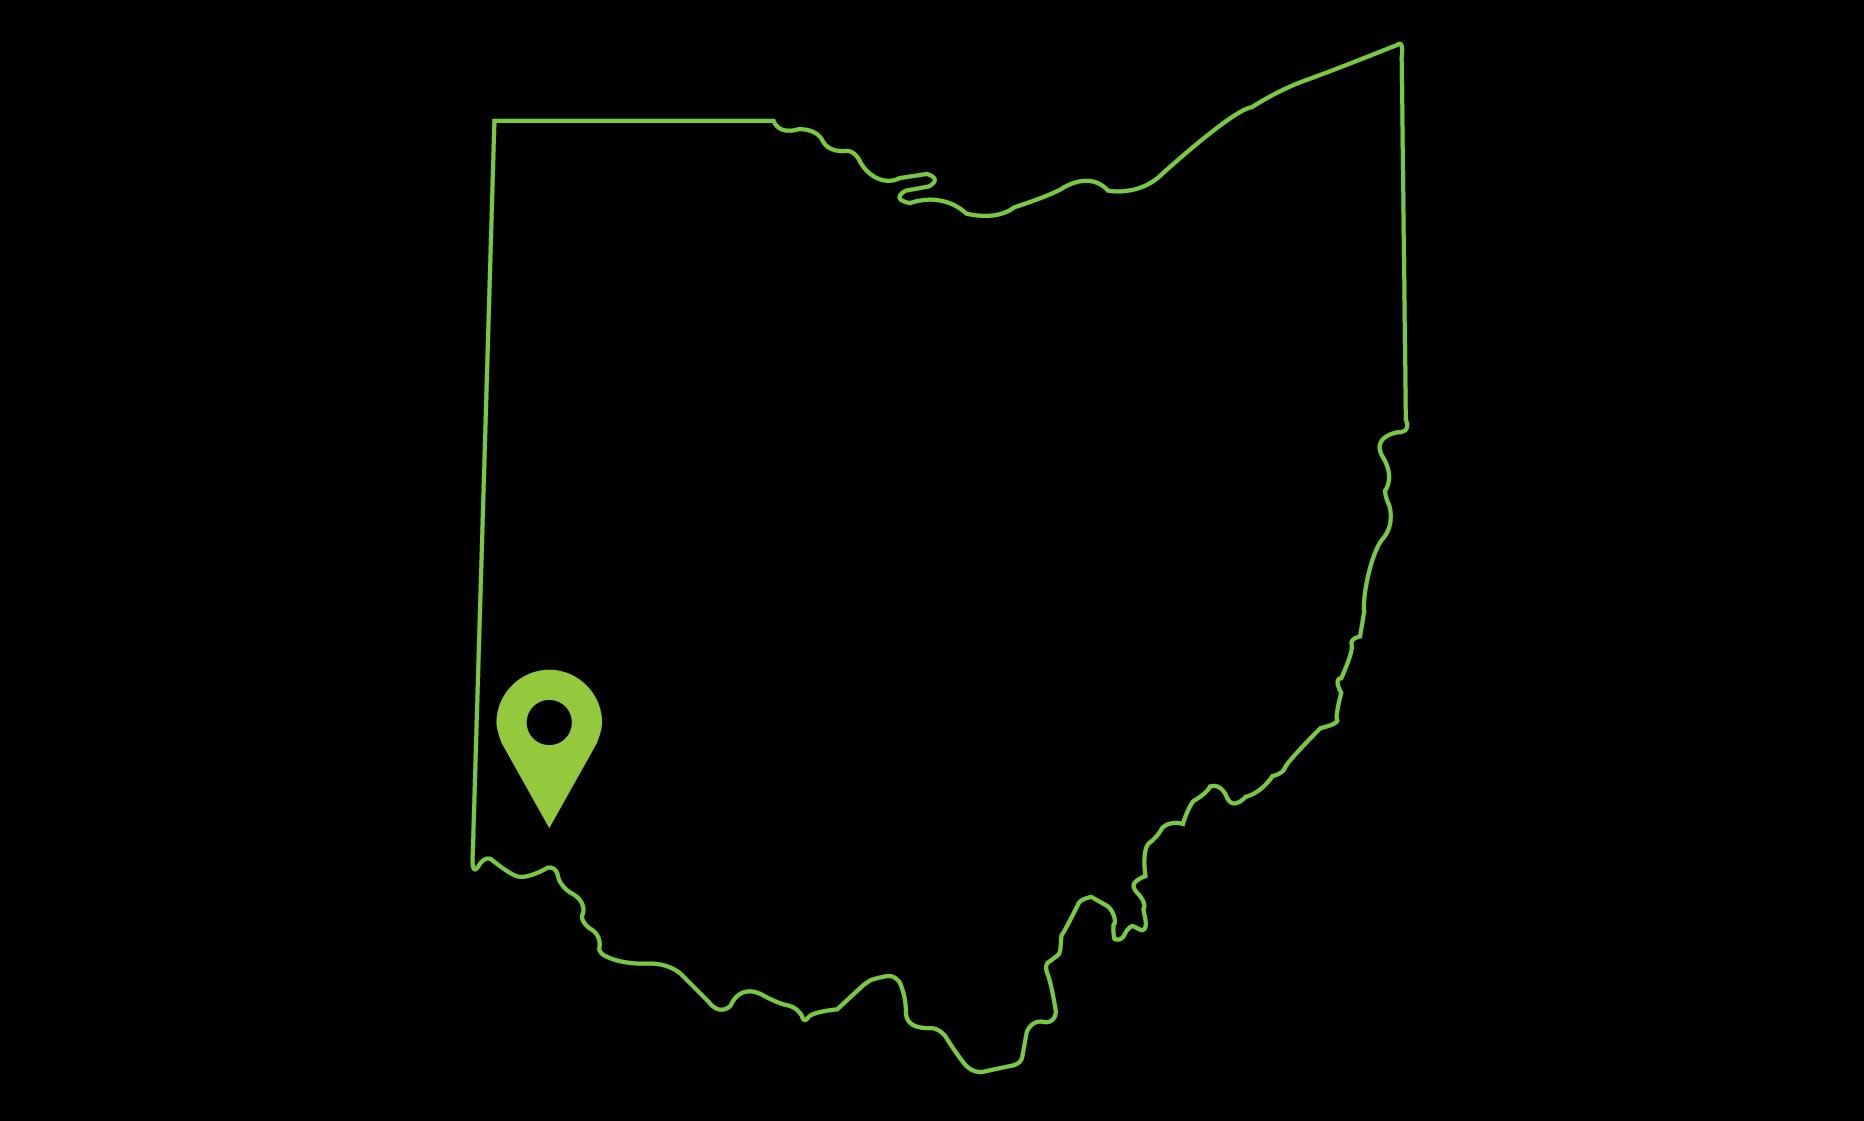 Ohio_Icon